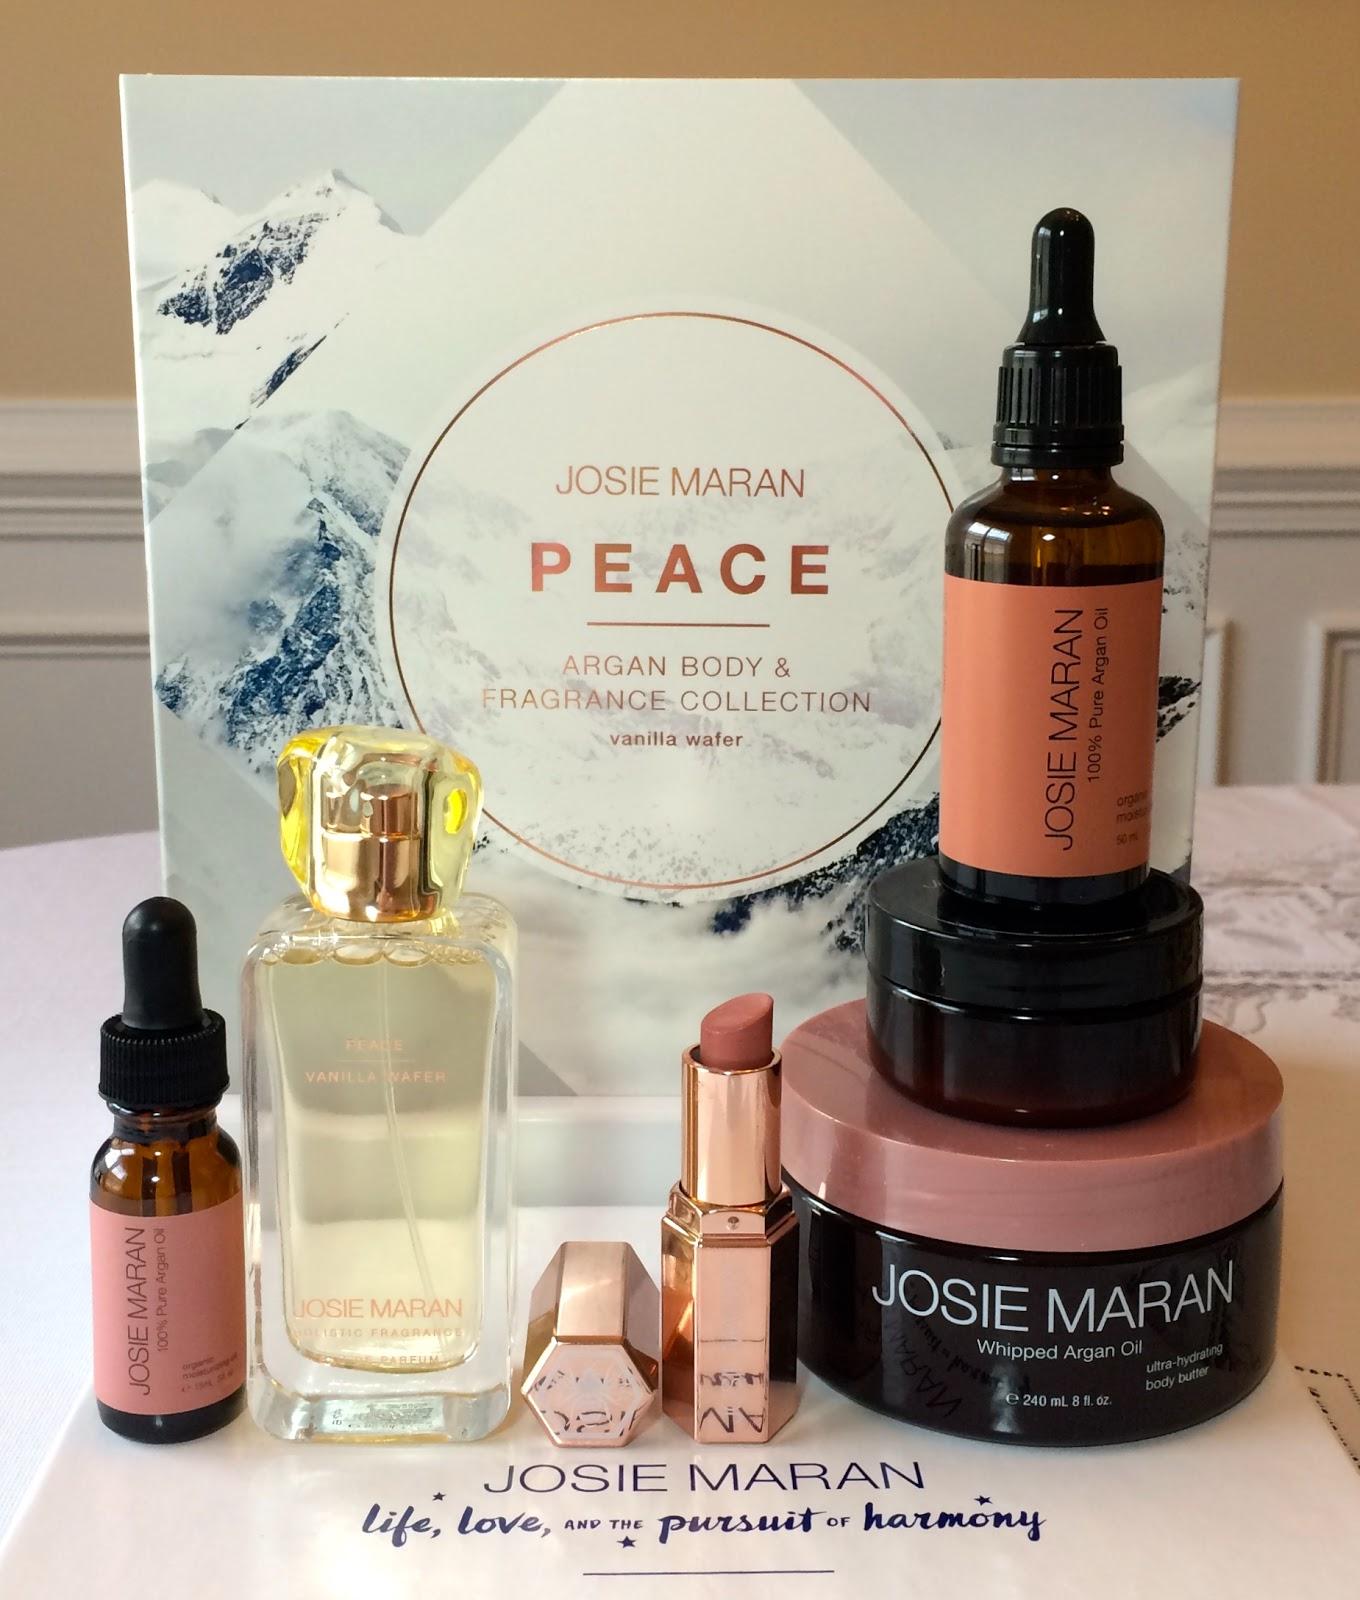 Blue apron qvc - Blue Skies For Me Please Qvc S Josie Maran Tsv Review Peace Love Joy Argan Body Fragrance Set